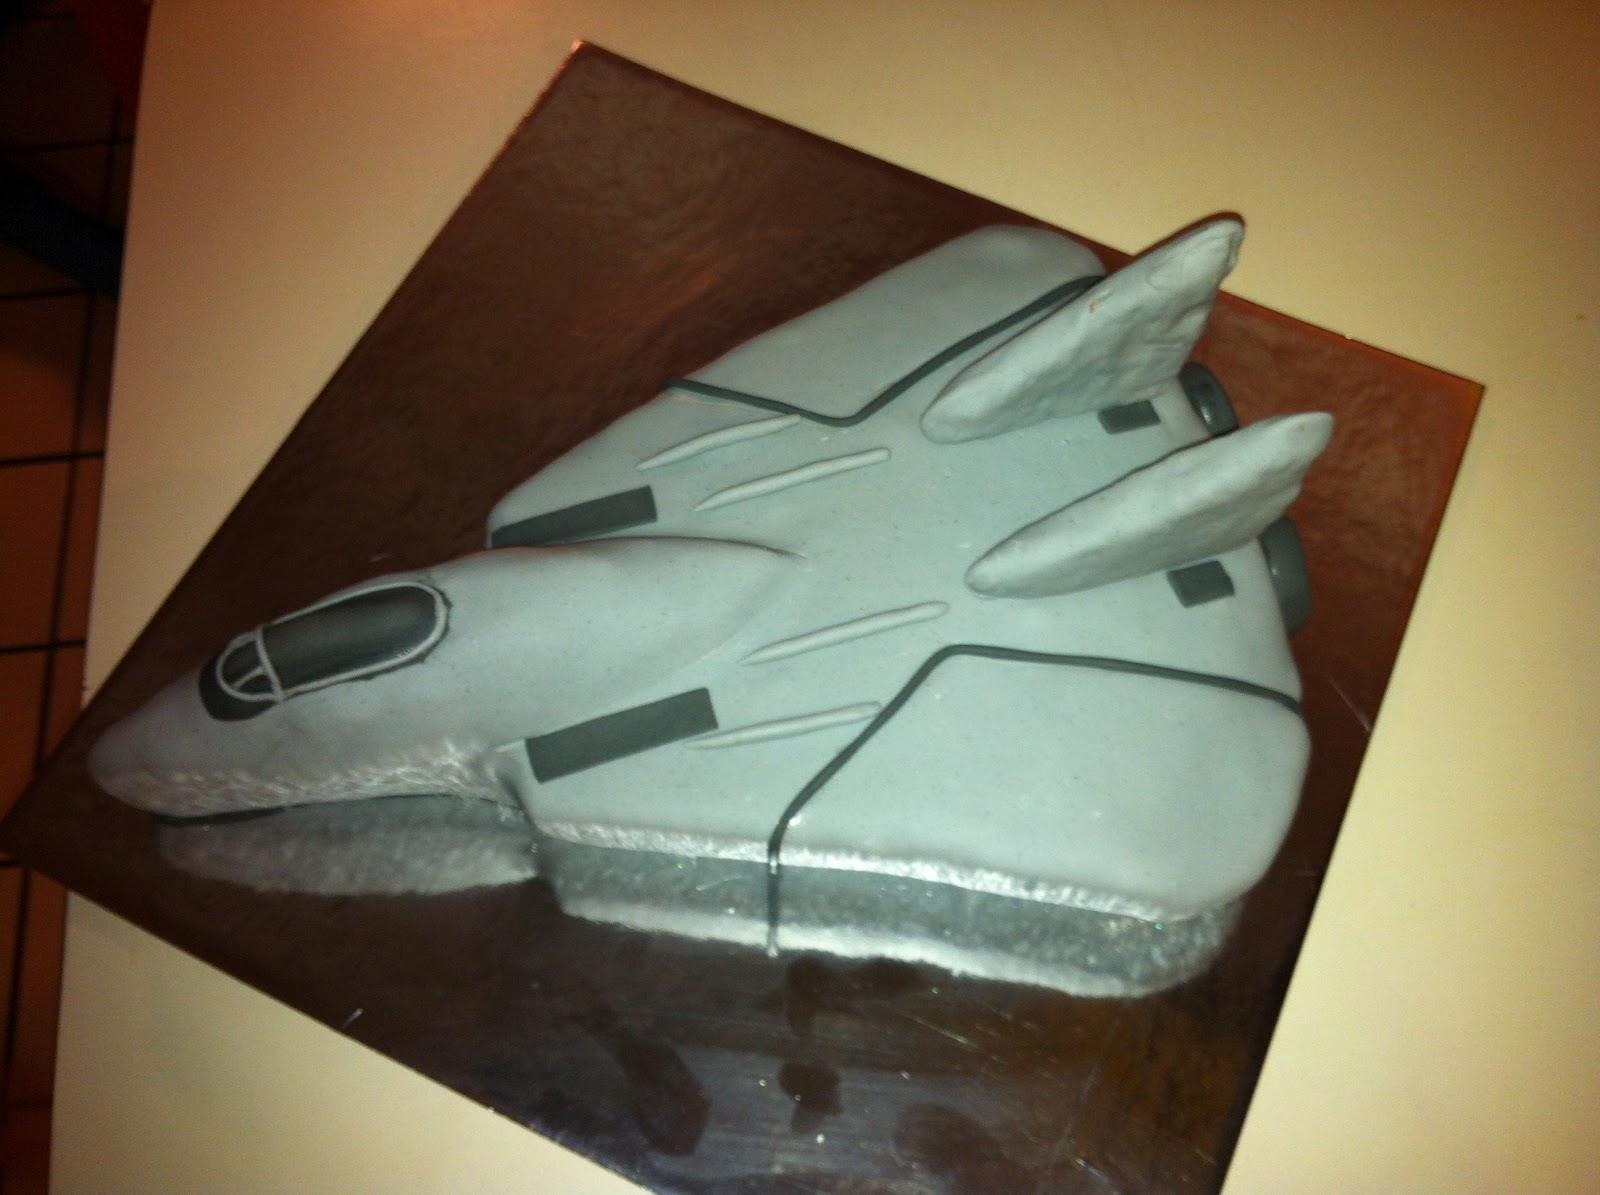 MarQuettes Jeremiahs F14 Tomcat